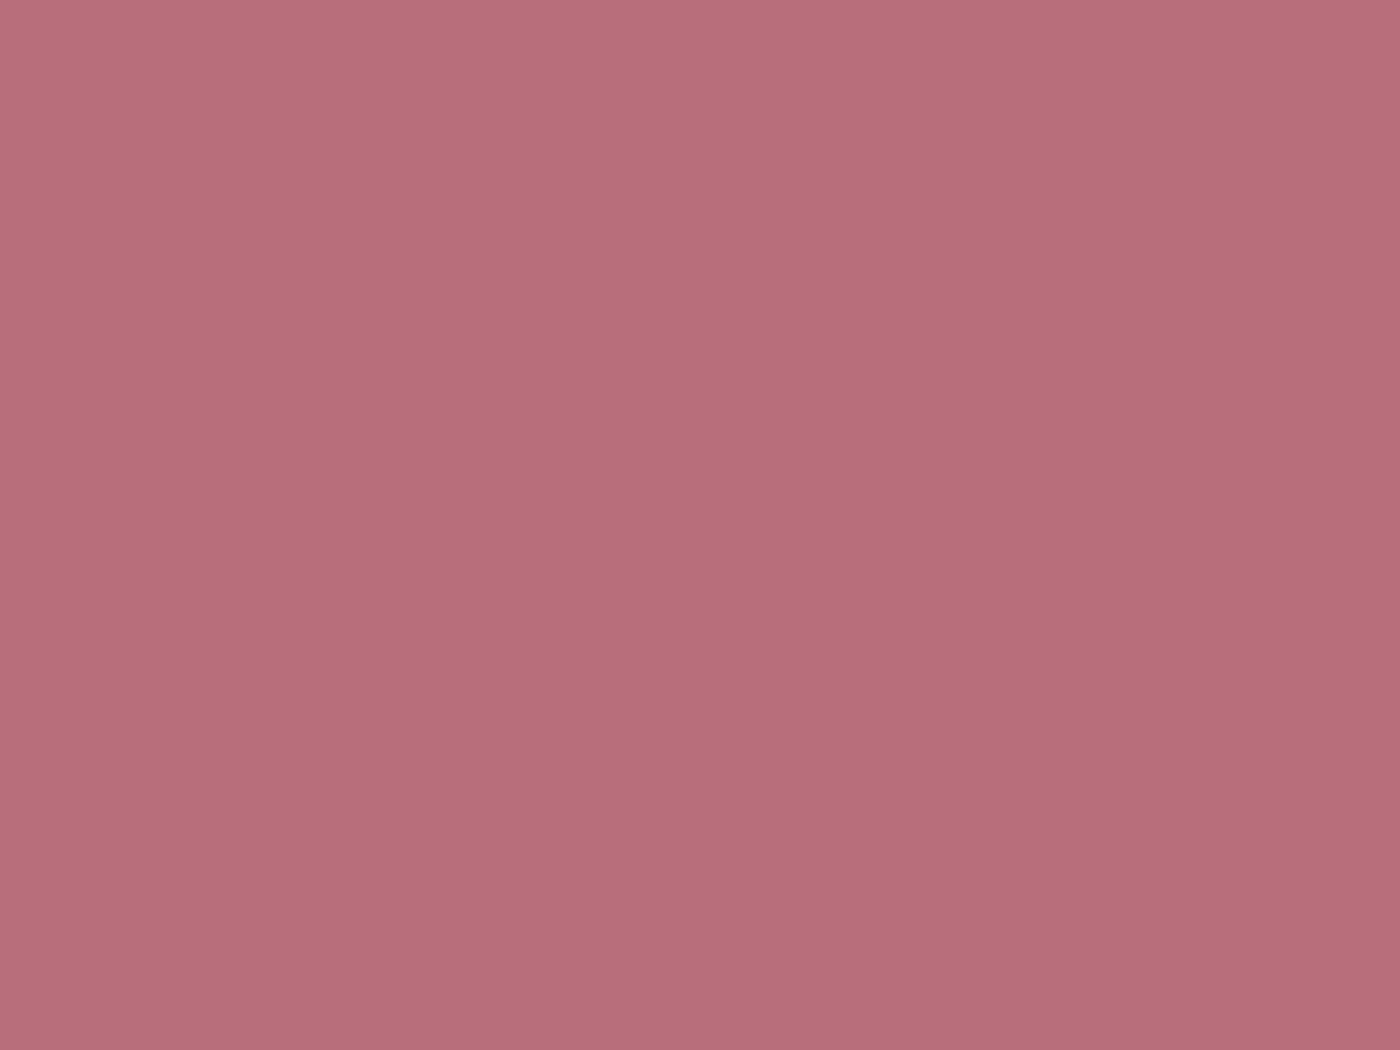 1400x1050 Rose Gold Solid Color Background